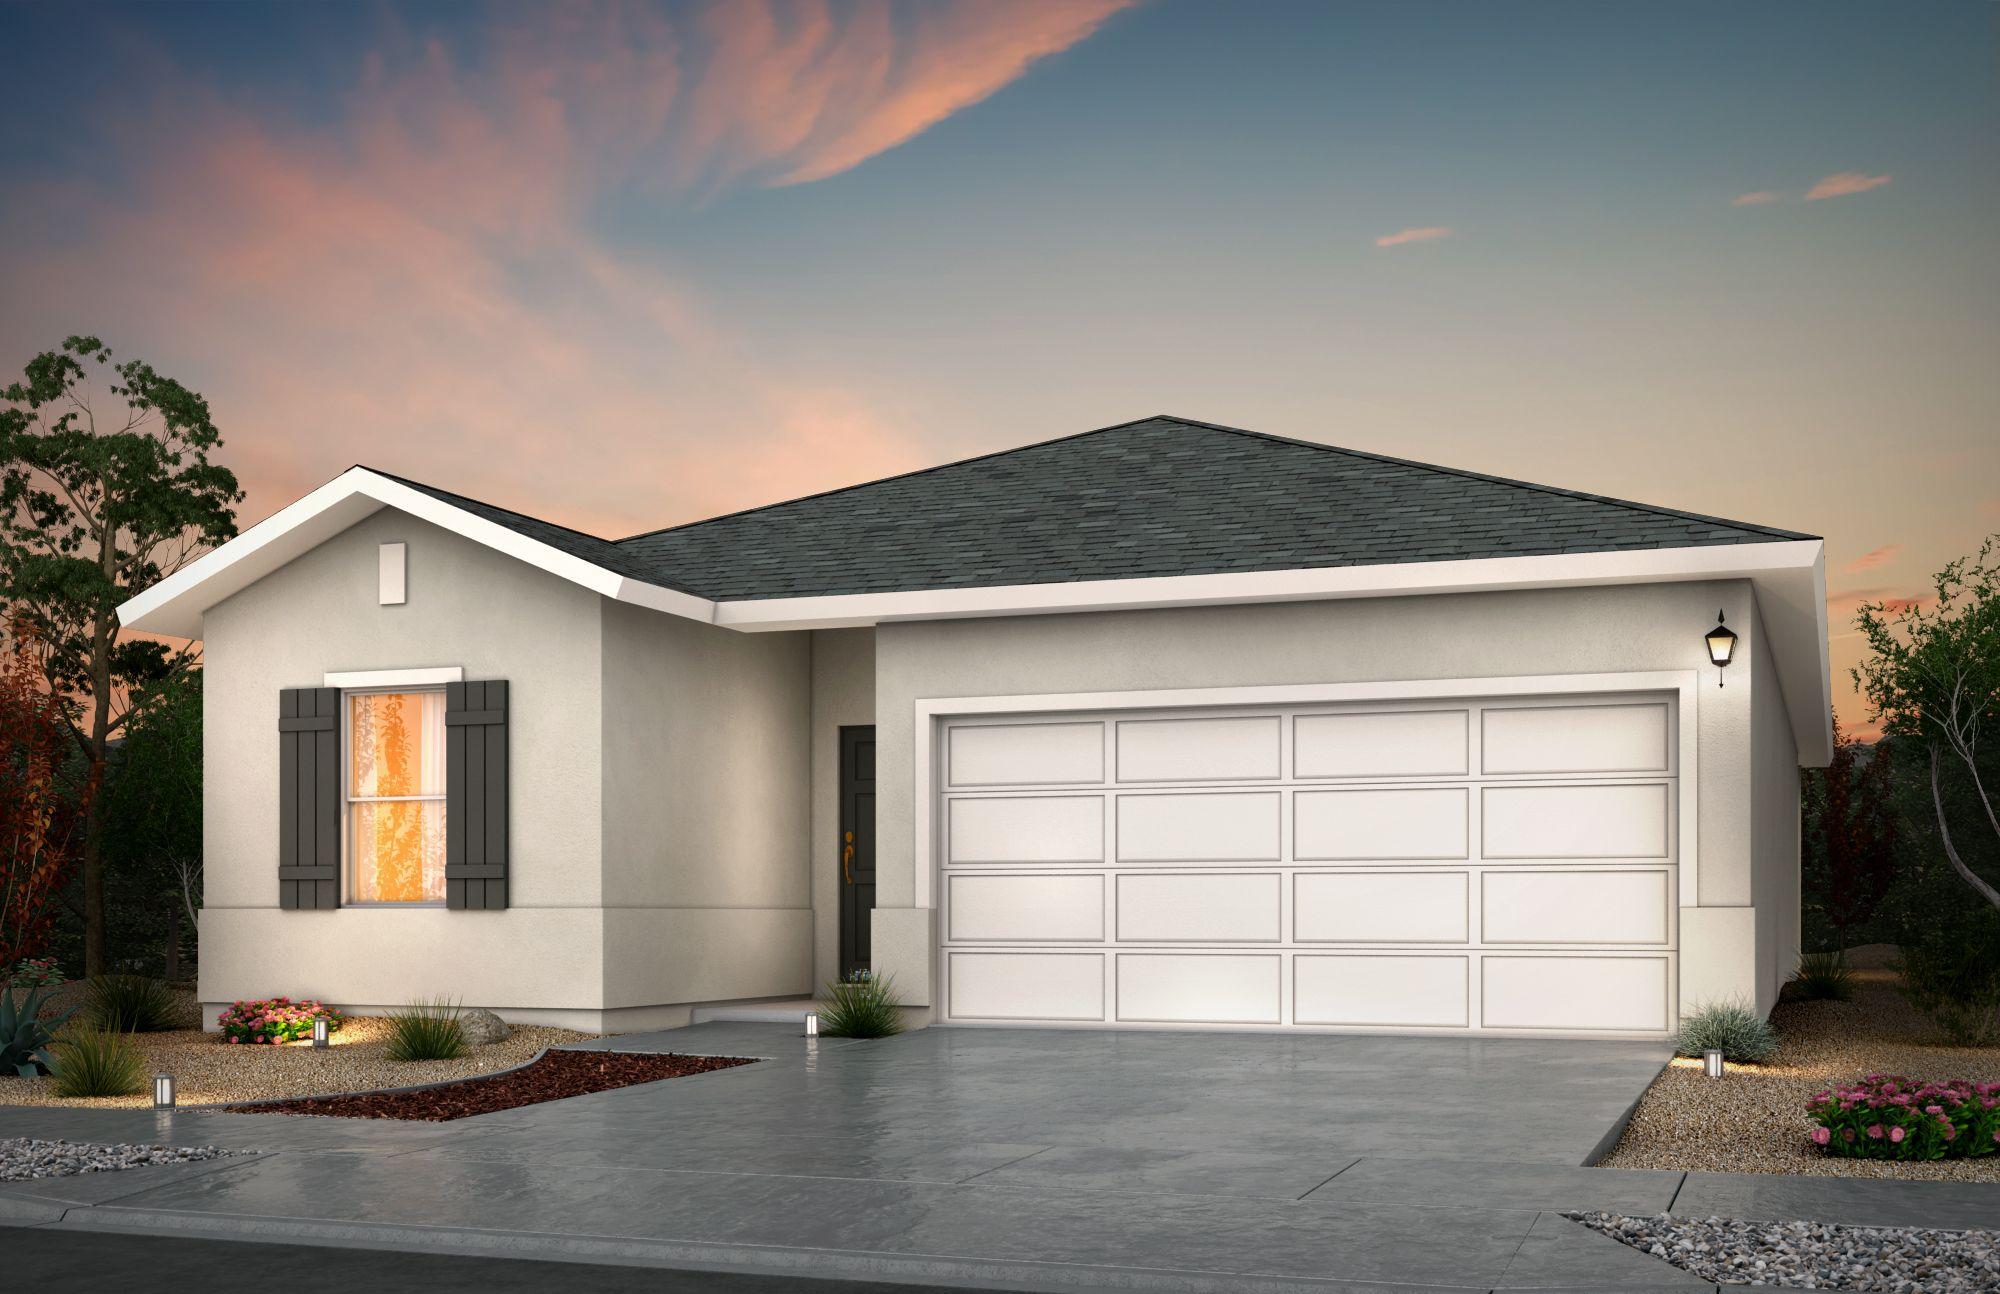 Exterior featured in the Mason By View Homes El Paso in El Paso, TX